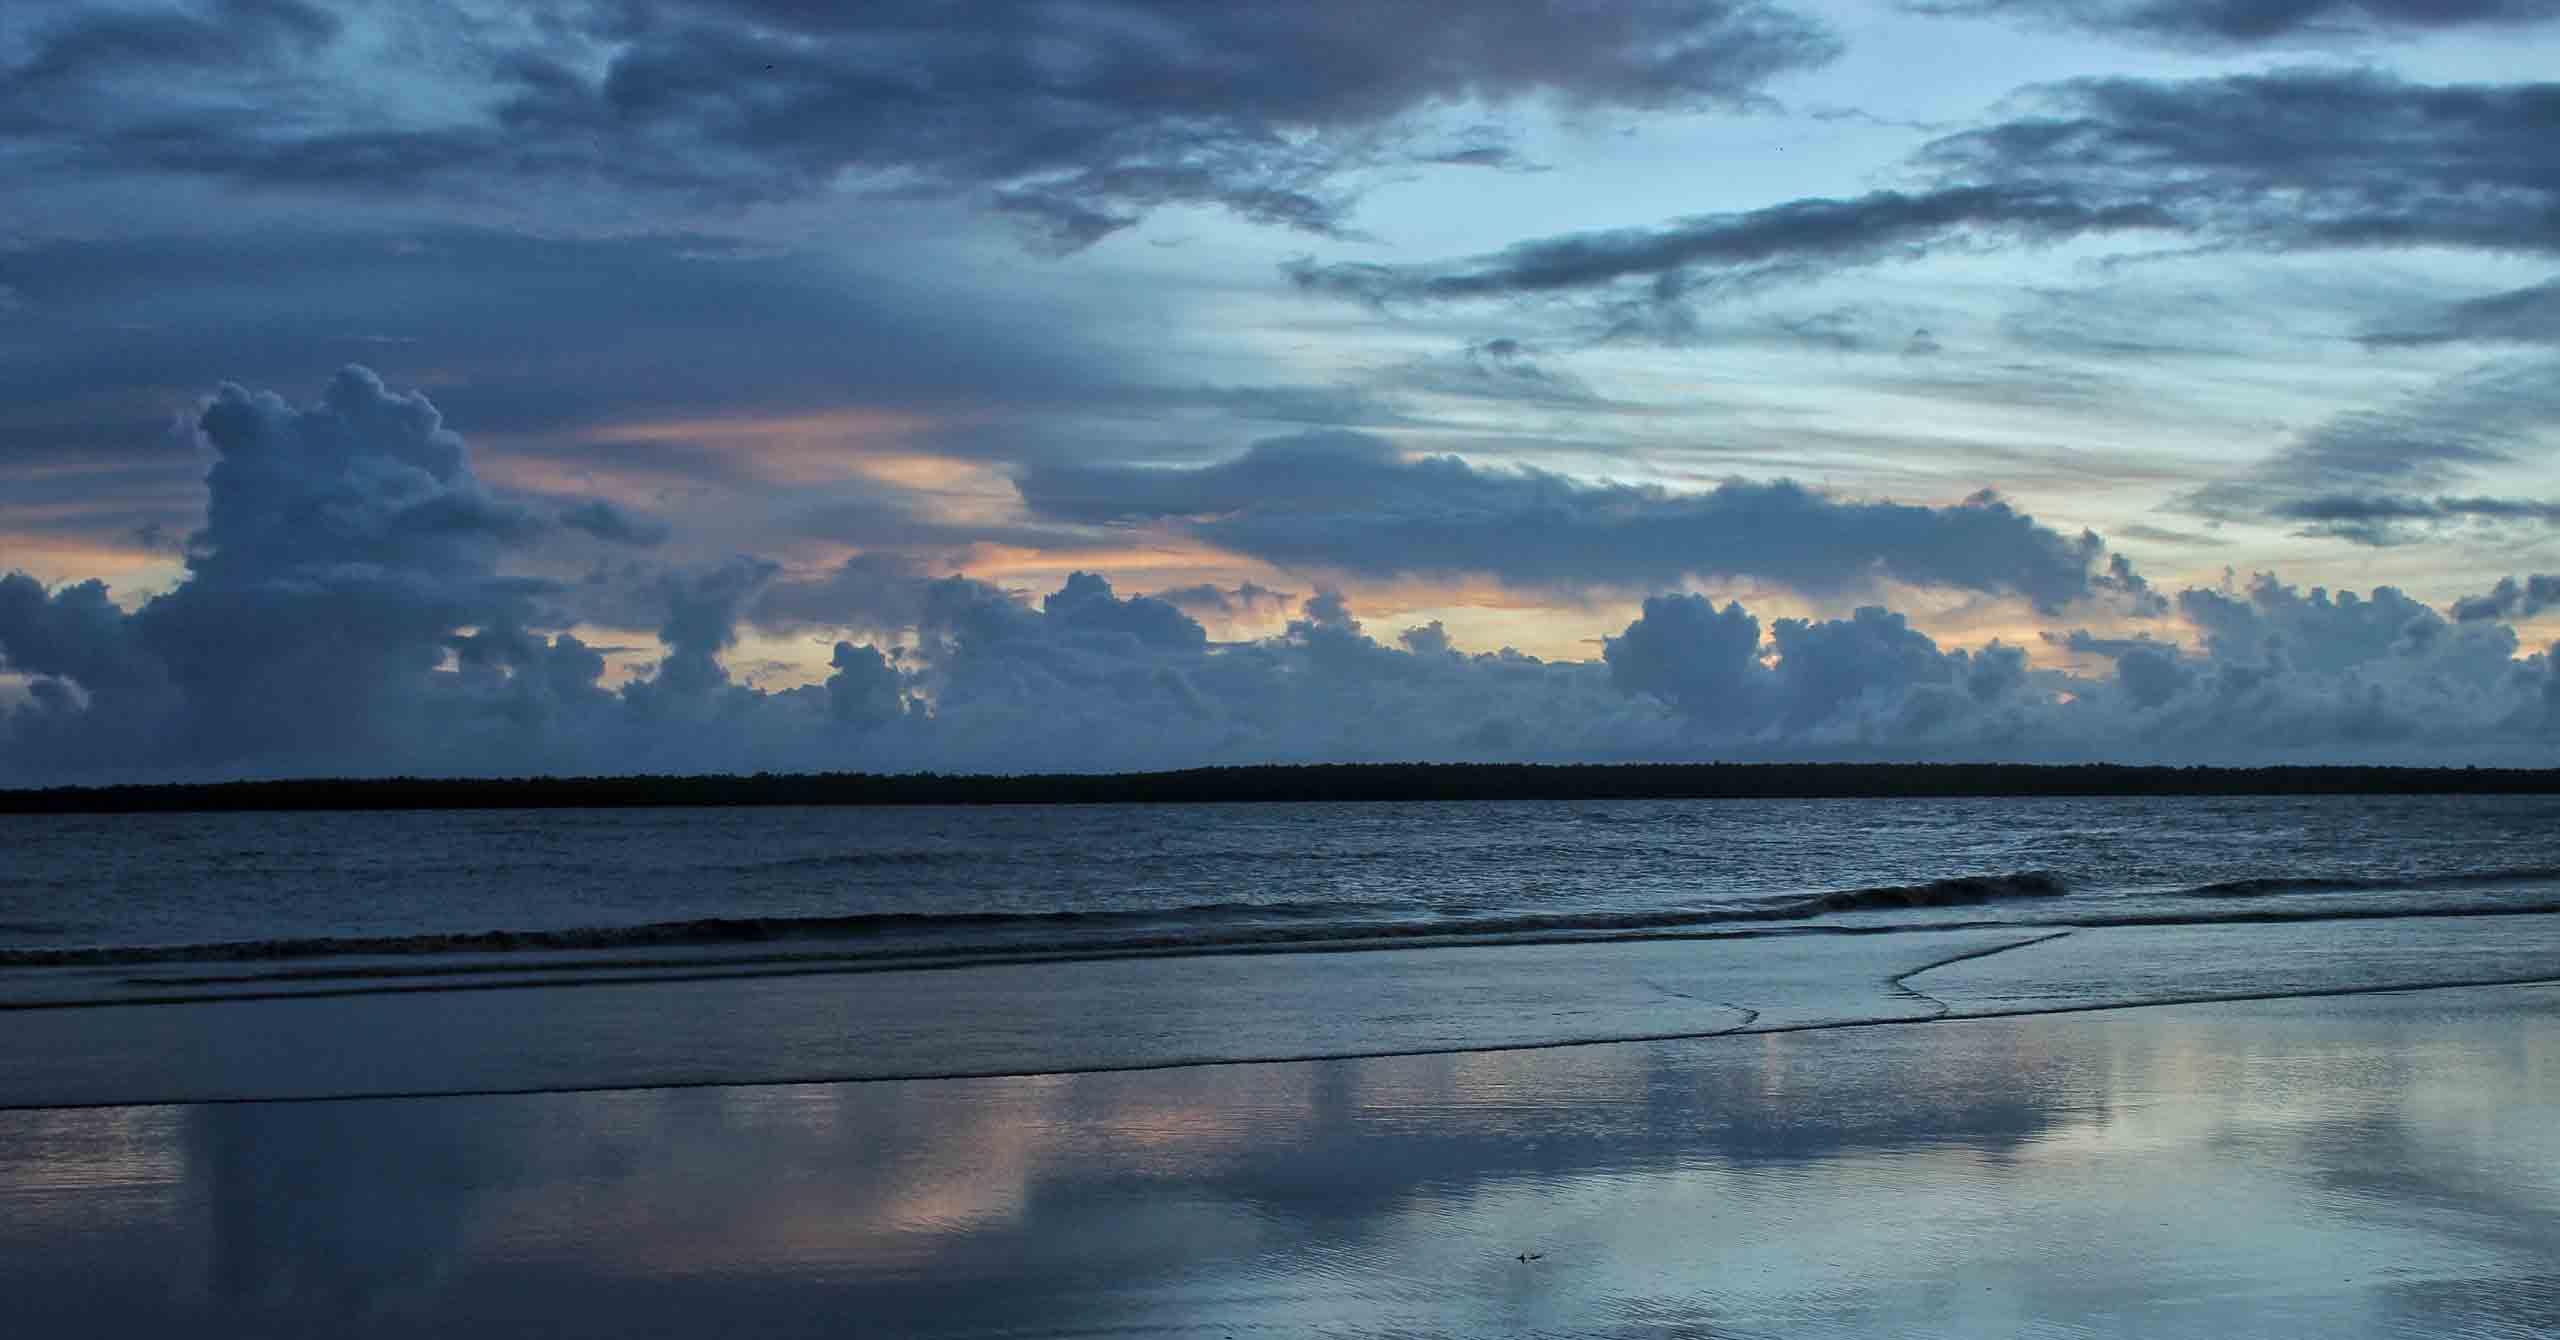 Nijhum Island – The Island of Silence